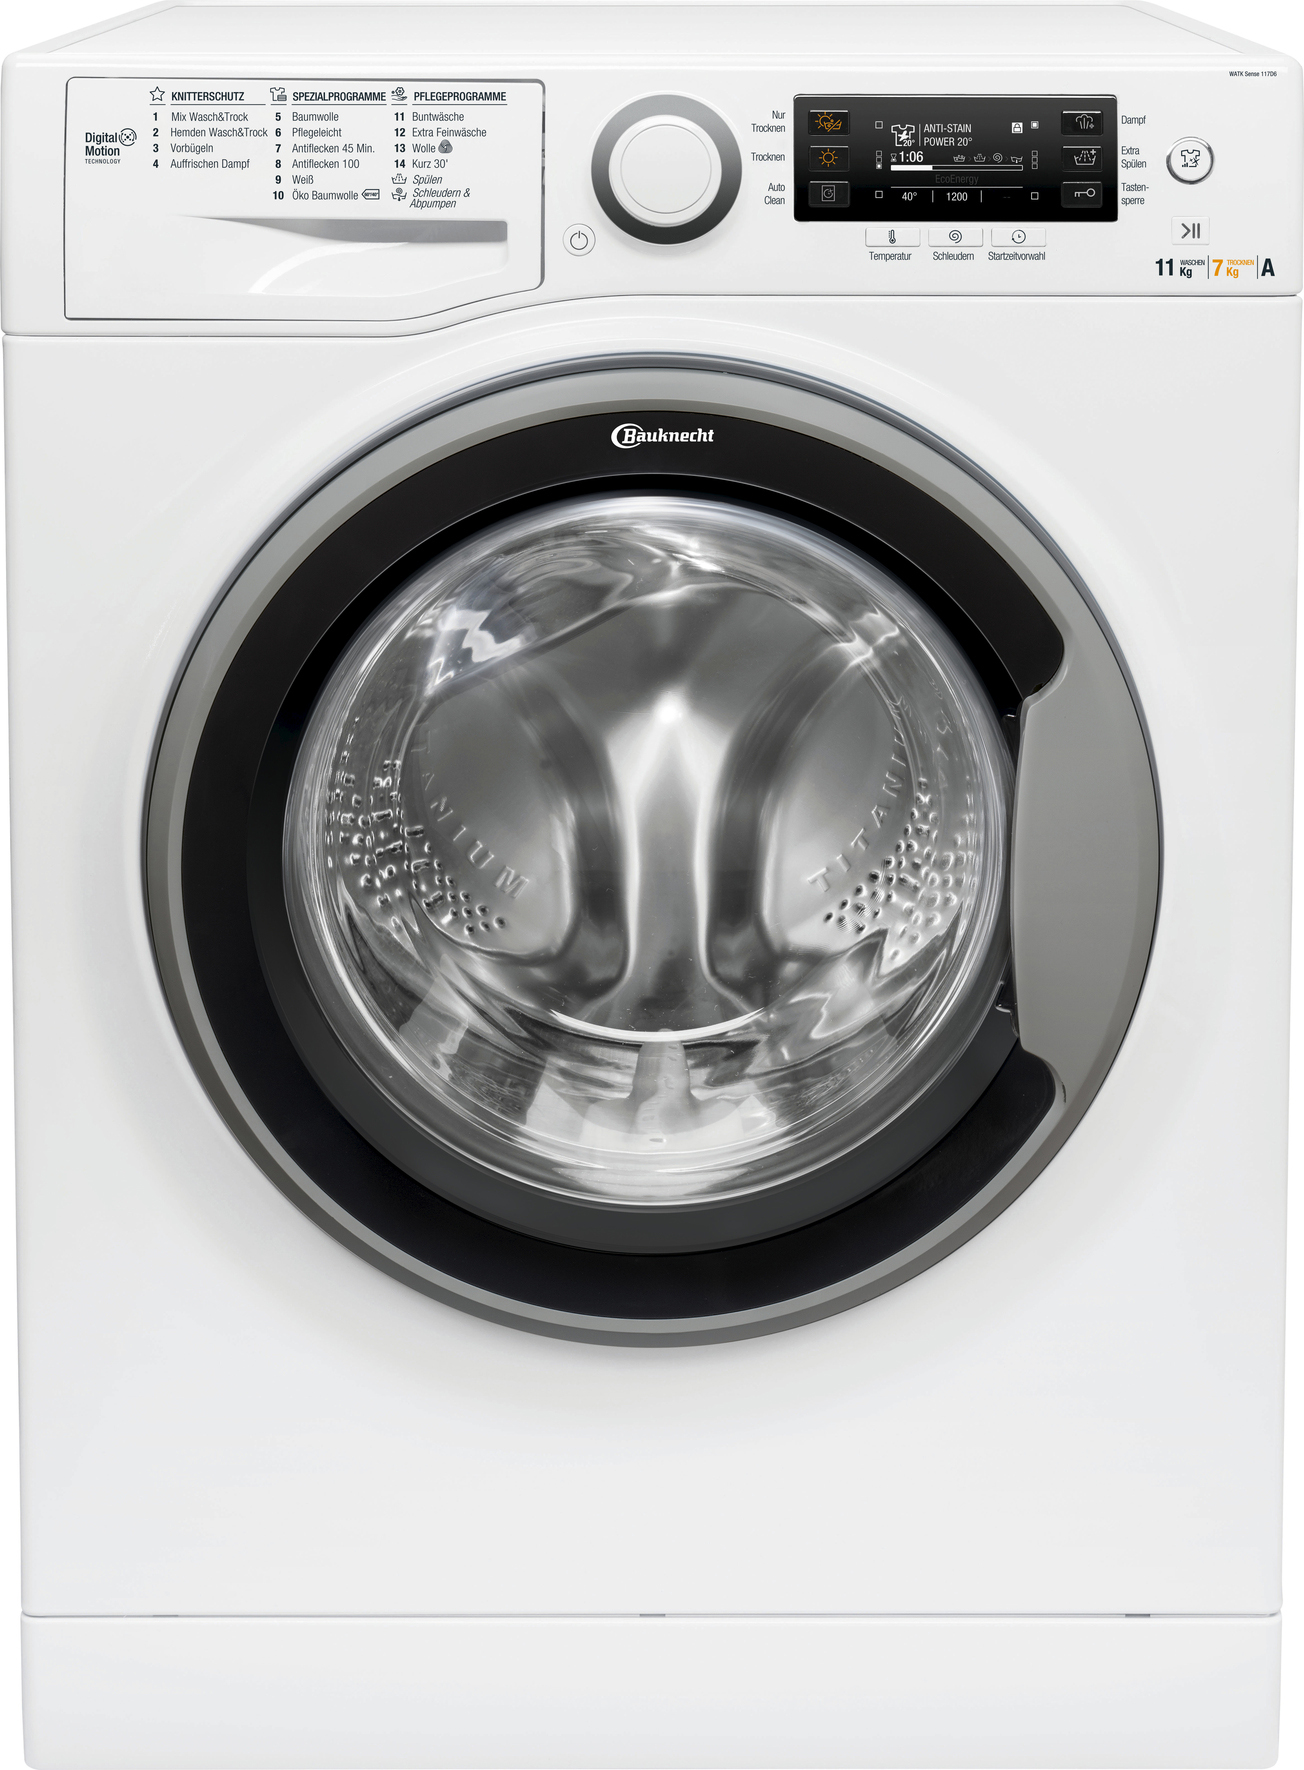 <h1>Bauknecht Waschtrockner WATK SENSE 117D6 EU</h1><h3 style='font-size: 20px; margin: 0px 0px 15px 0px;'> -11 kg Waschen, 7 kg Trocknen, SteamCare Knitterschutzprogramme, Nachlegefunktion</h3>